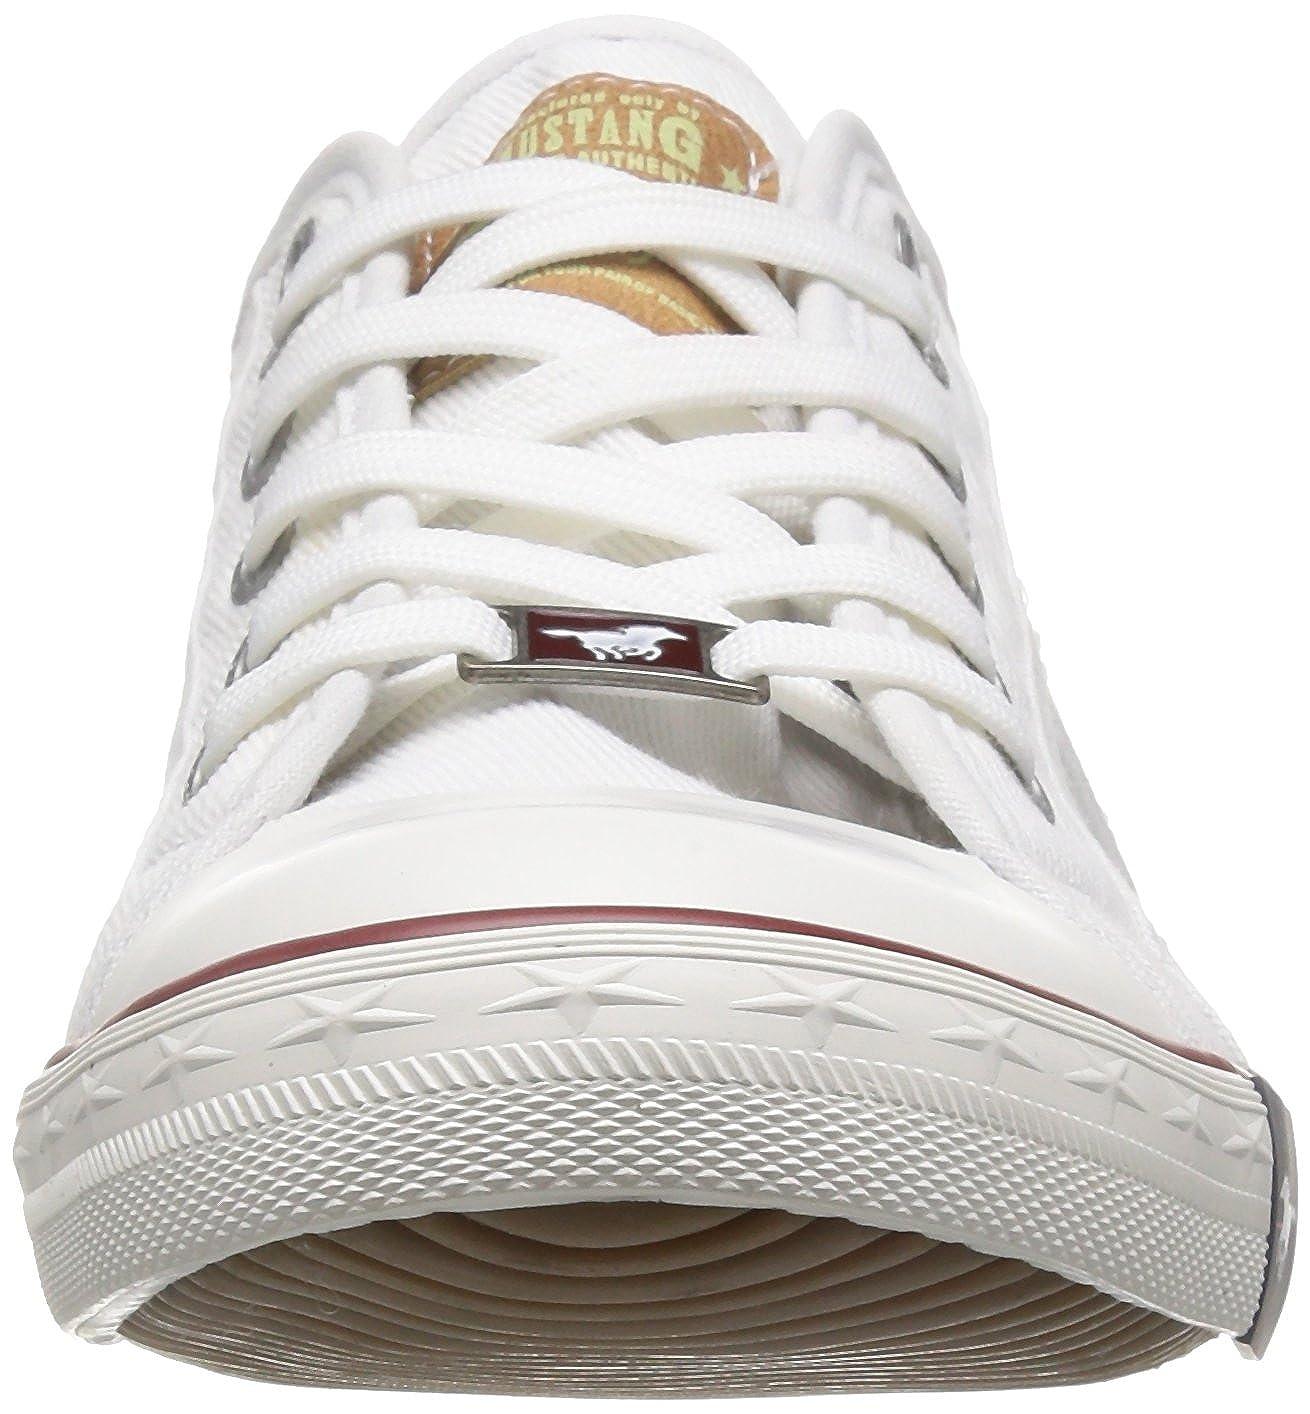 Bags Sneakers Shoes 1 Top Amazon co uk 4058 305 amp; Mustang Men's Low RHBCg